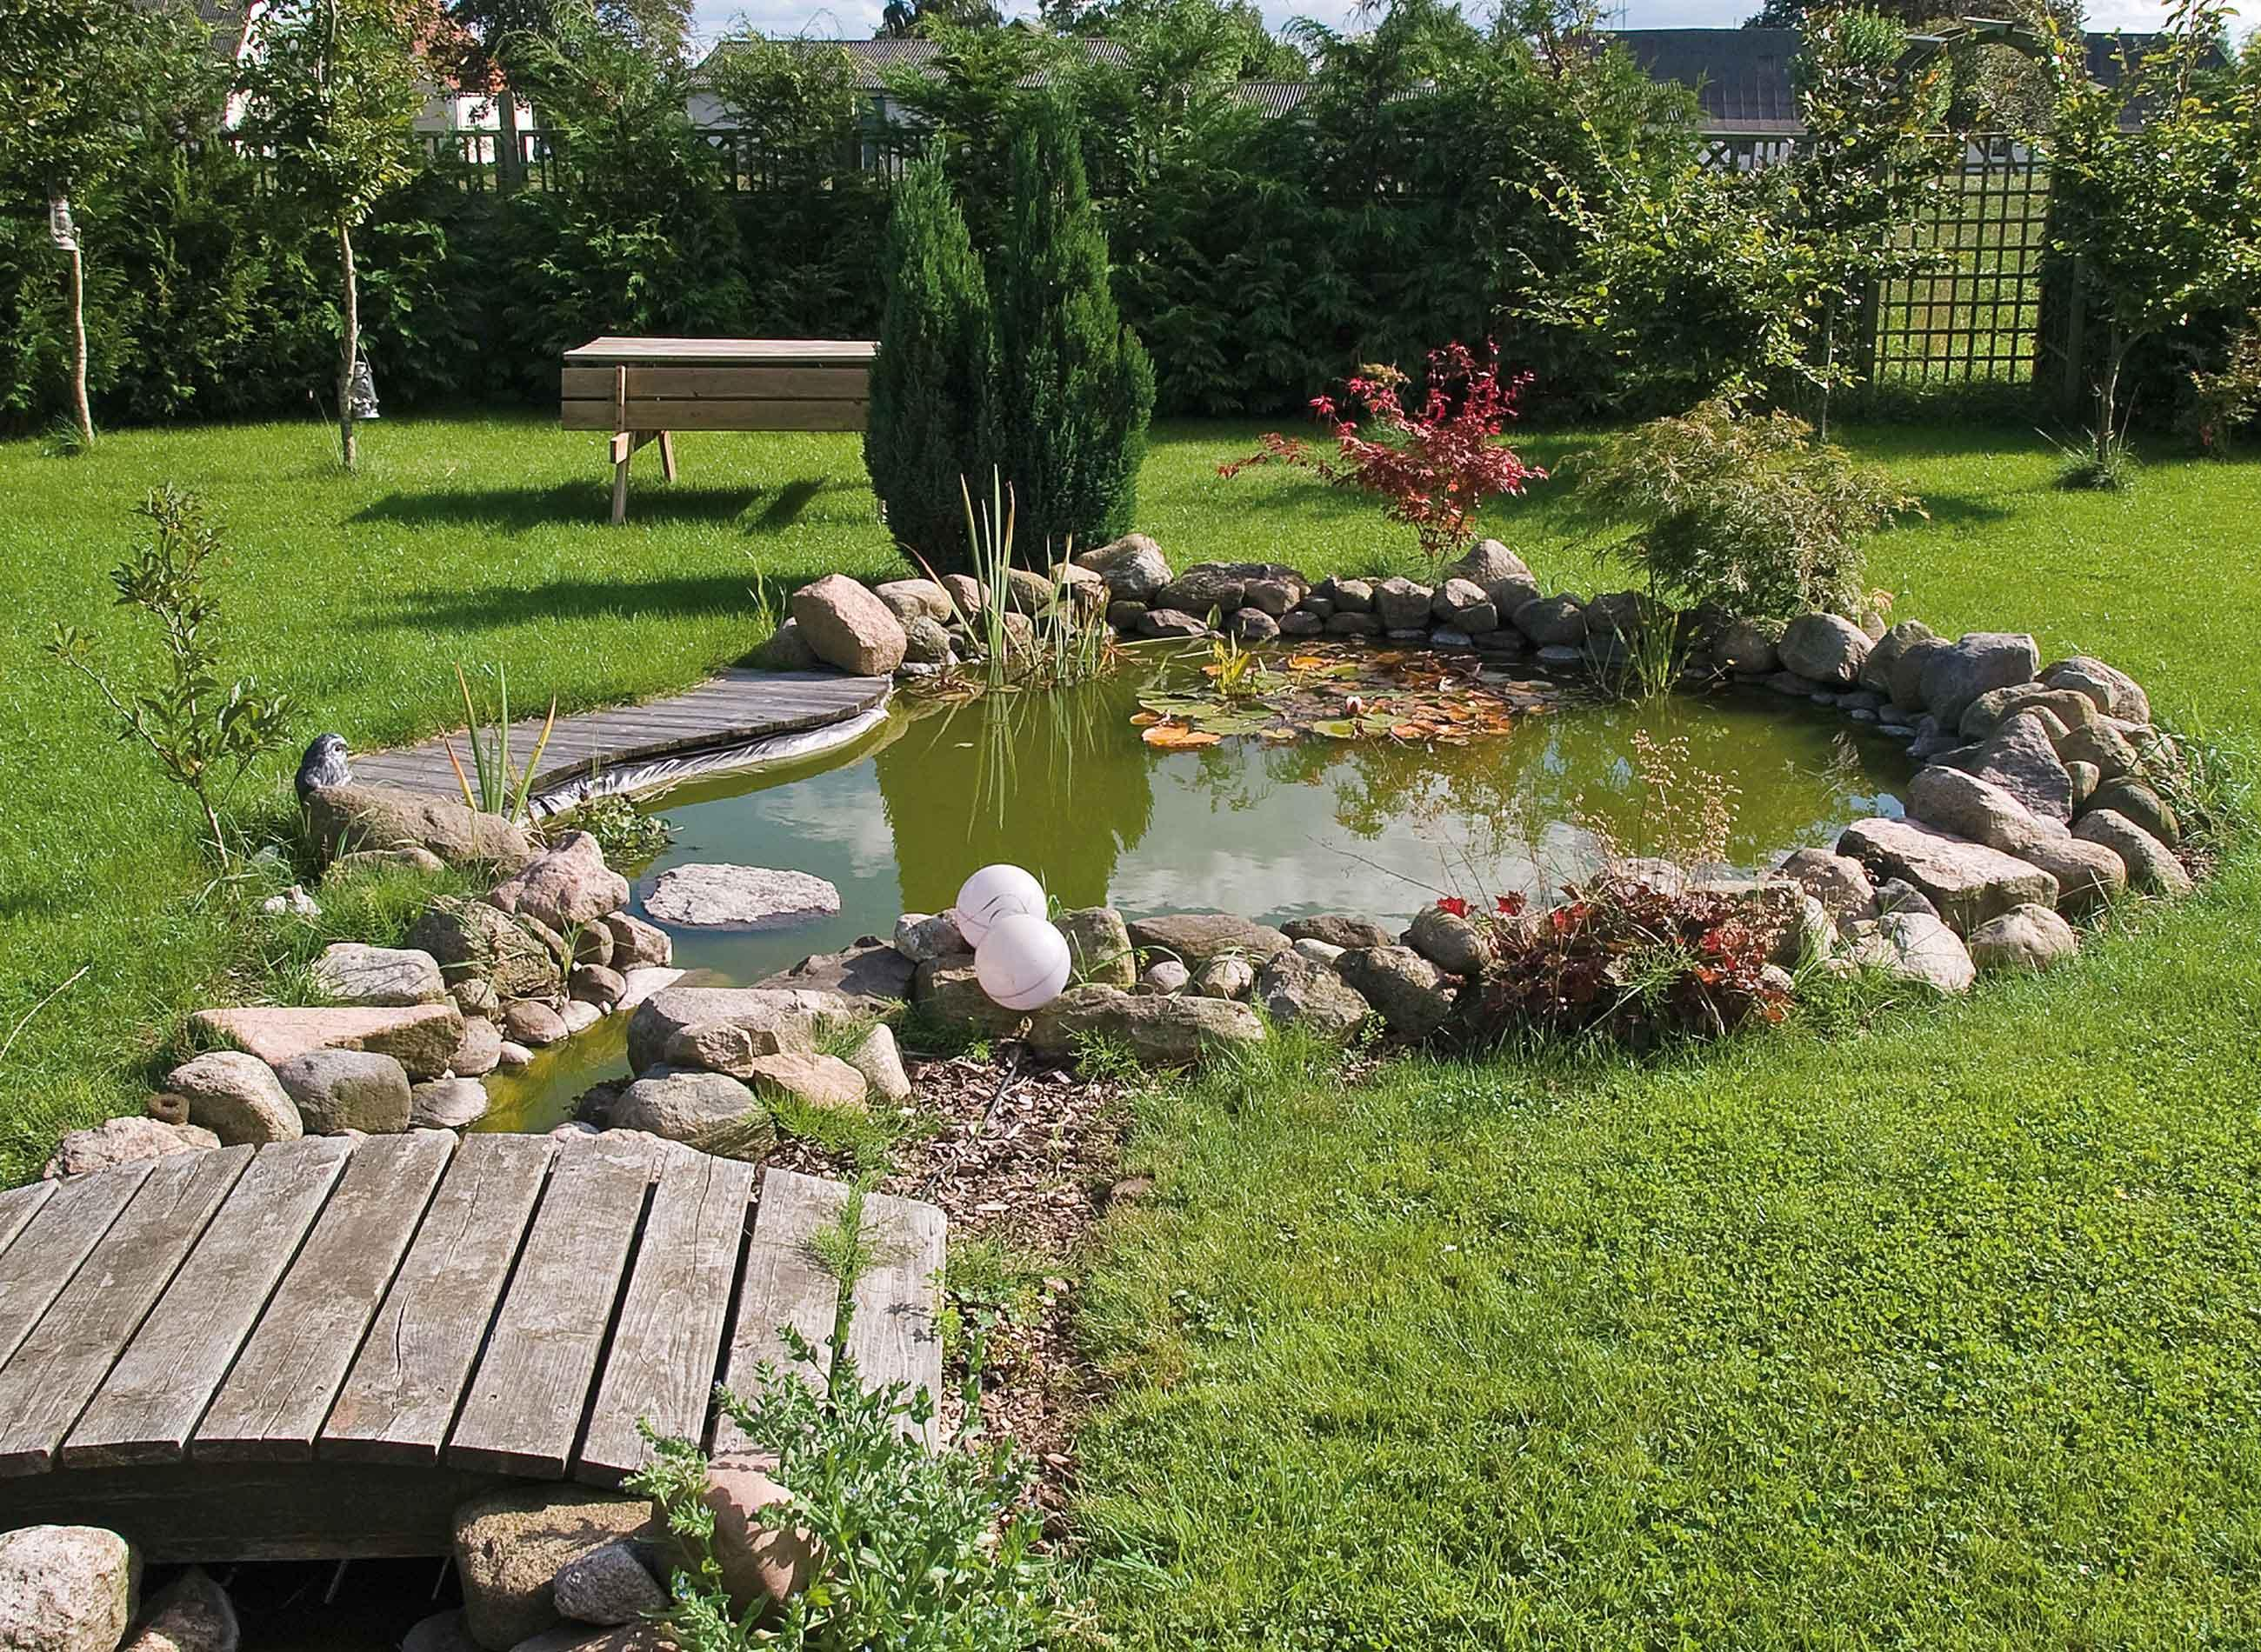 Amnagement bassin extrieur Lille  Cration tang jardin